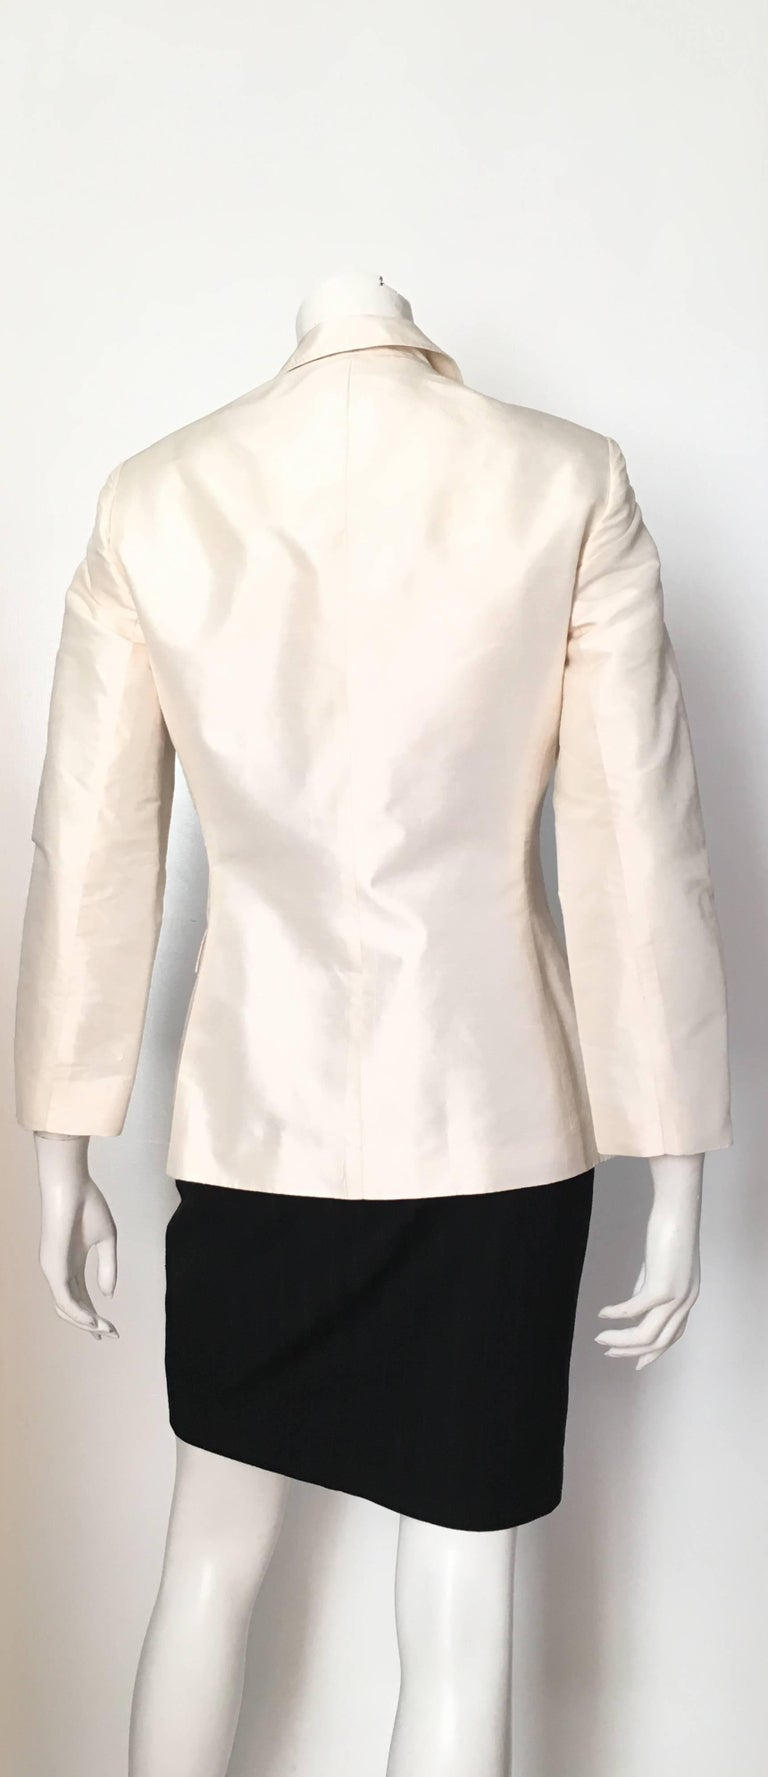 Oscar de la Renta White Silk Evening Jacket Size 6. For ...